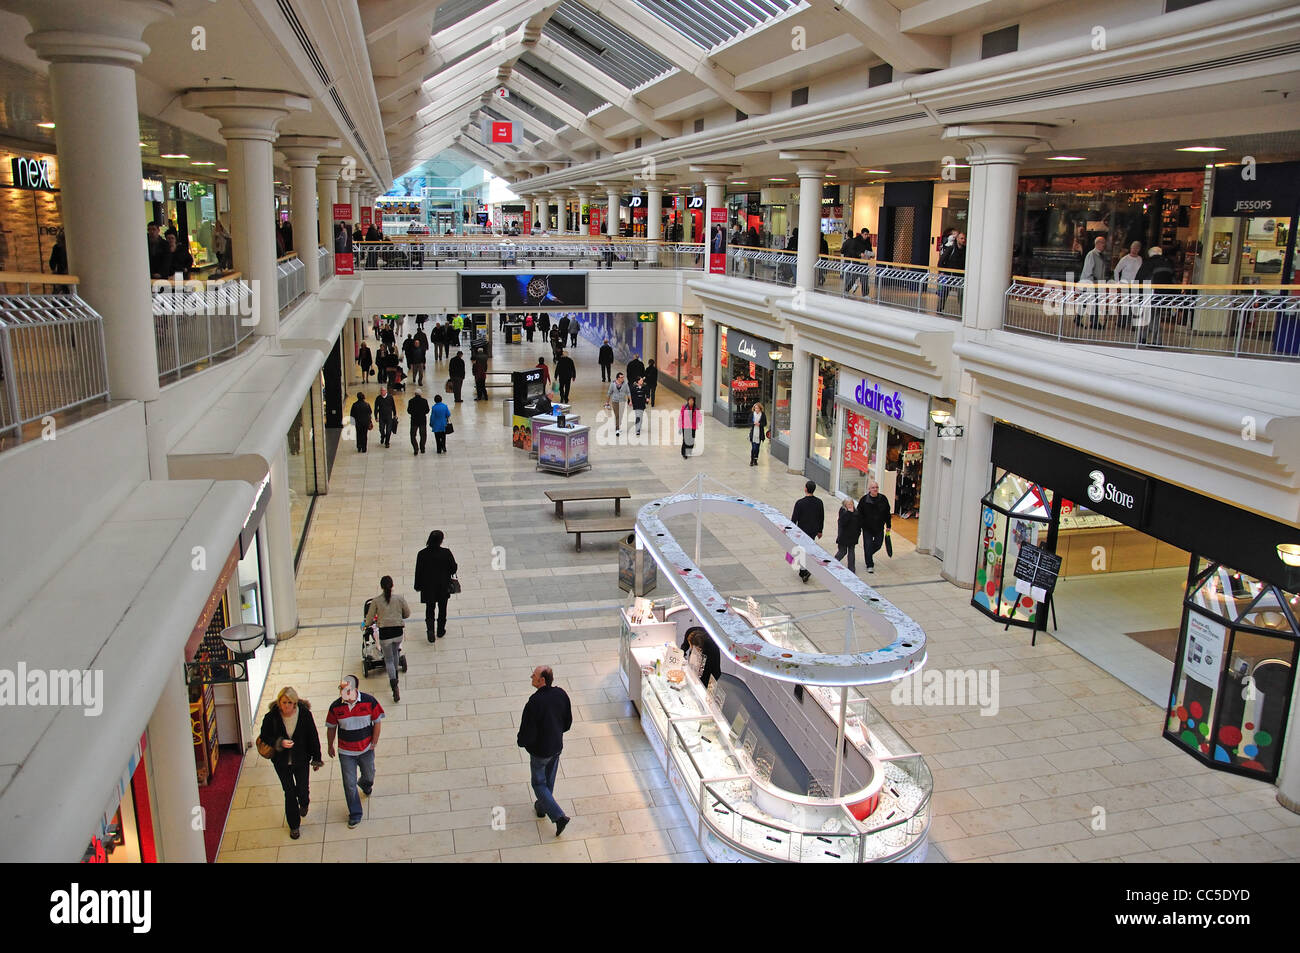 Interior of Metro Shopping Centre, Gateshead, Tyne and Wear, England, United Kingdom - Stock Image